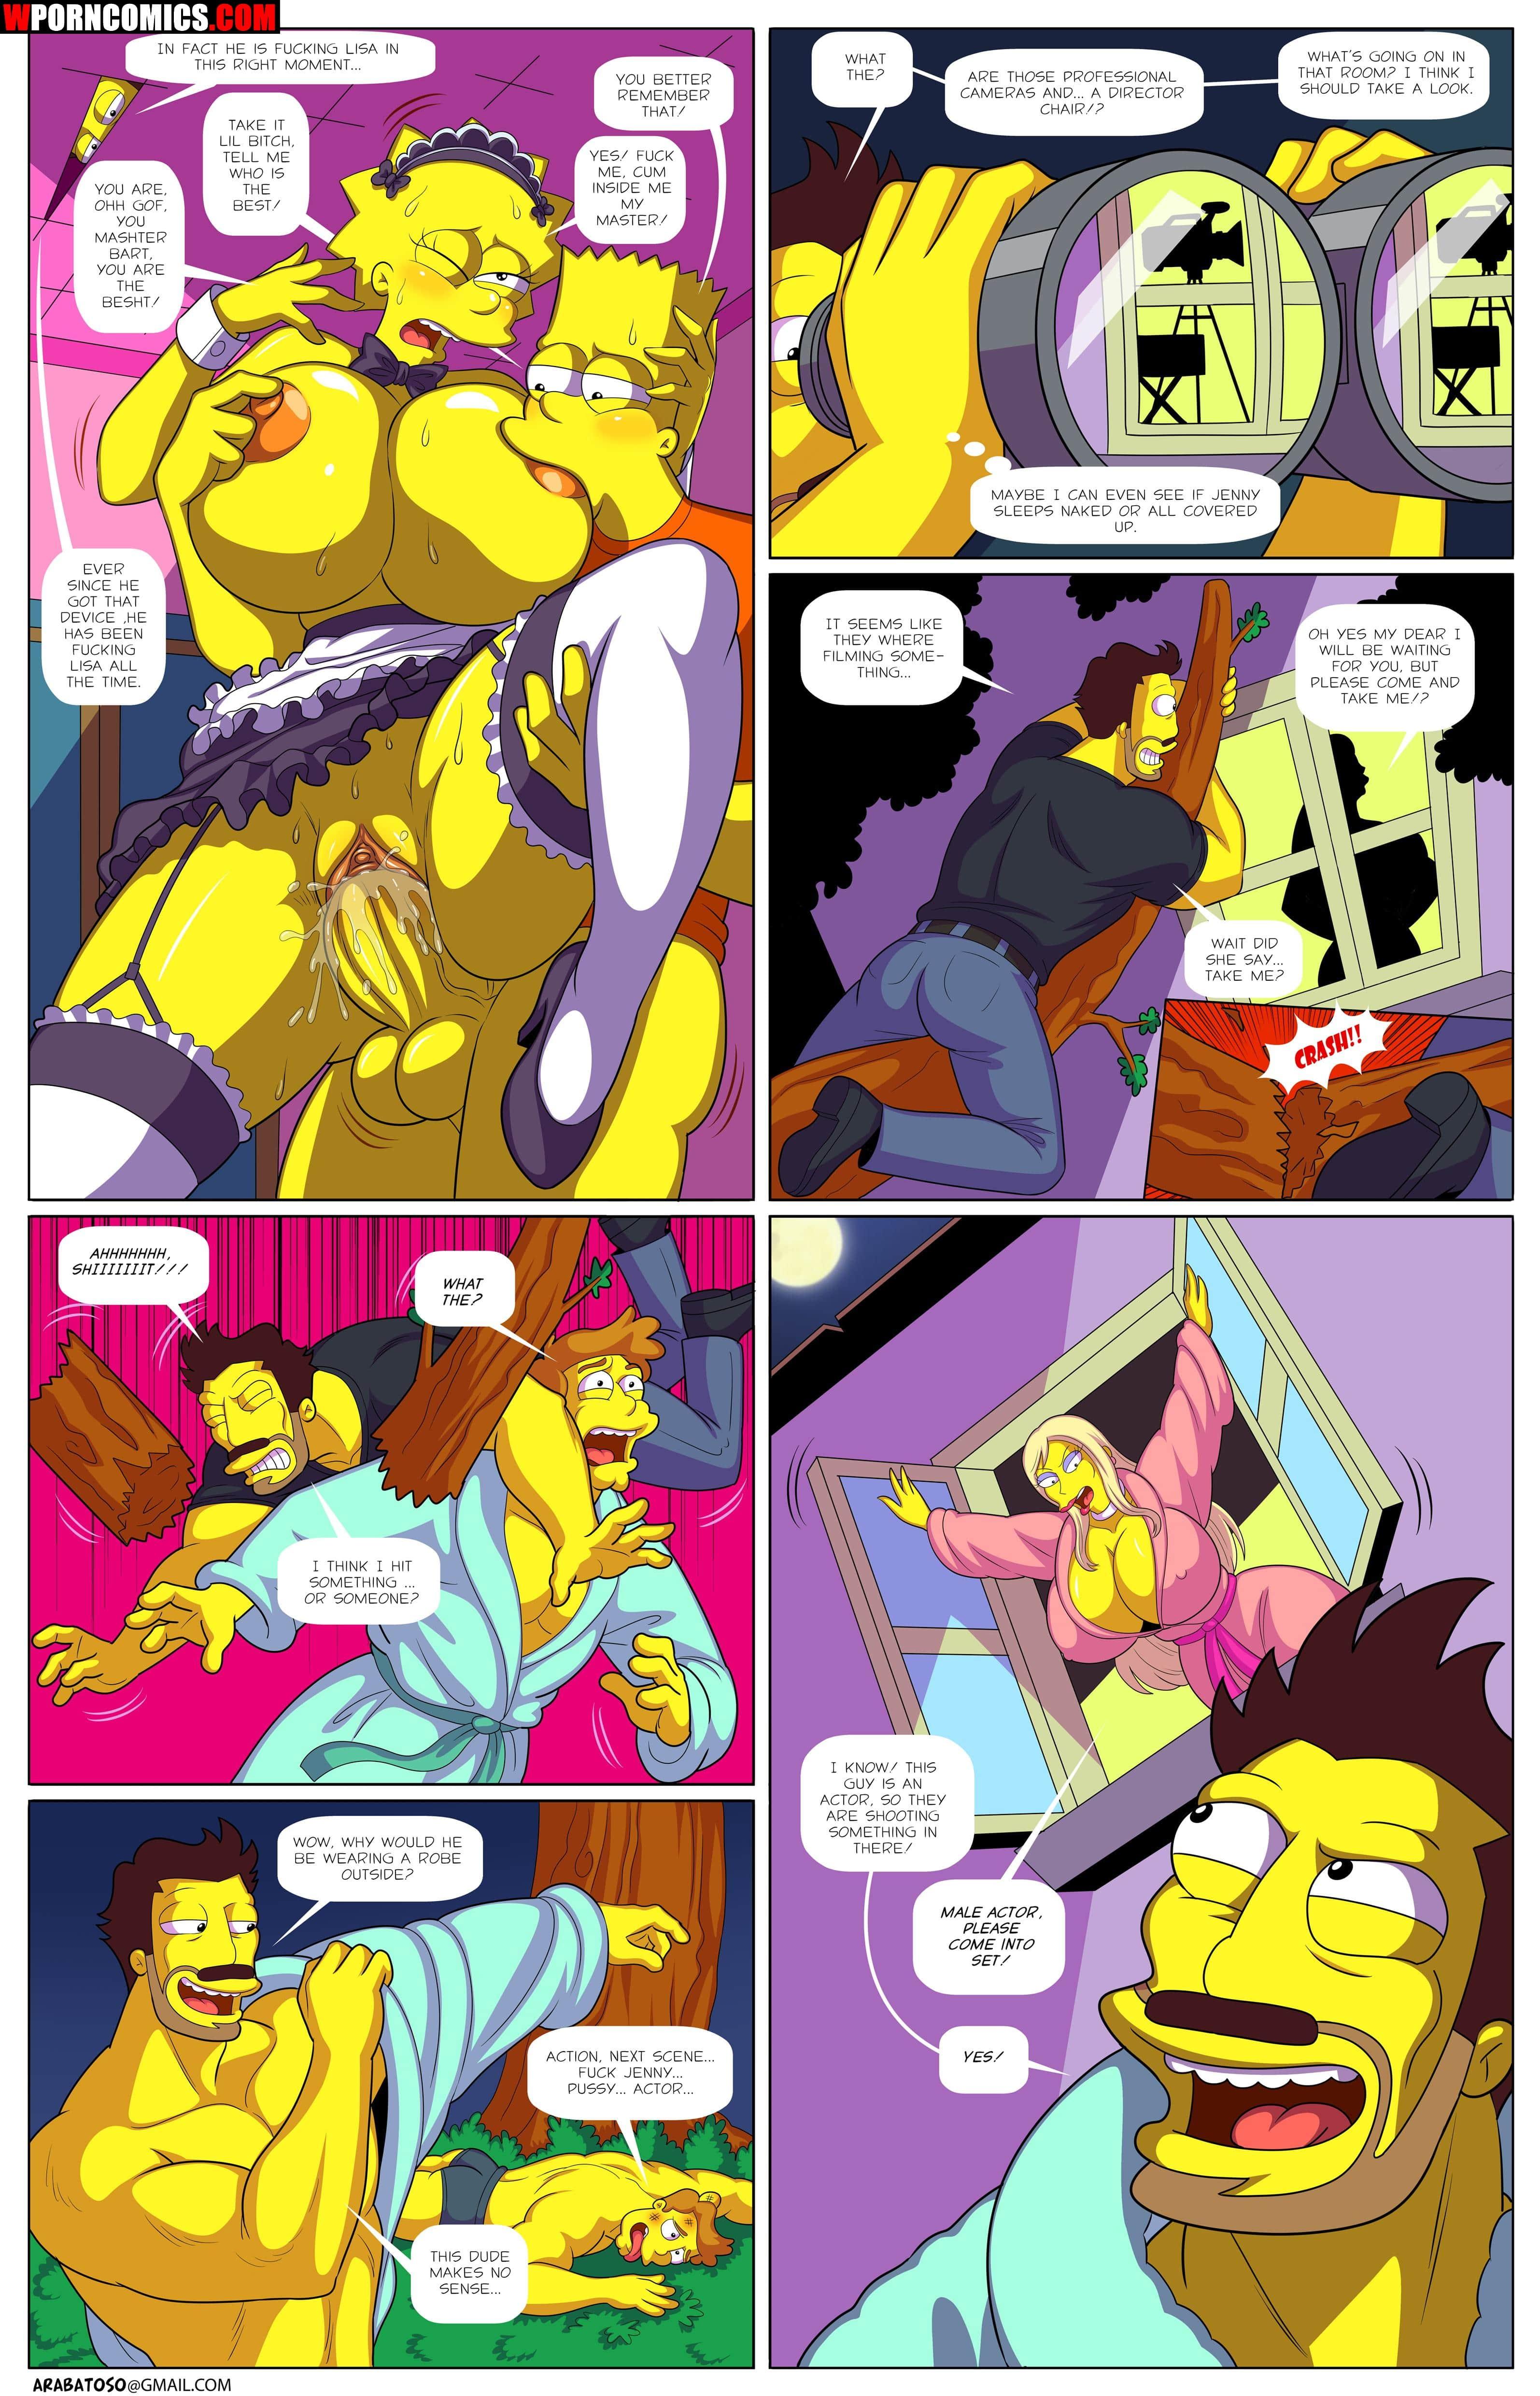 porn-comic-simpsons-darrens-adventure-part-3-2020-03-22/porn-comic-simpsons-darrens-adventure-part-3-2020-03-22-1123.jpg